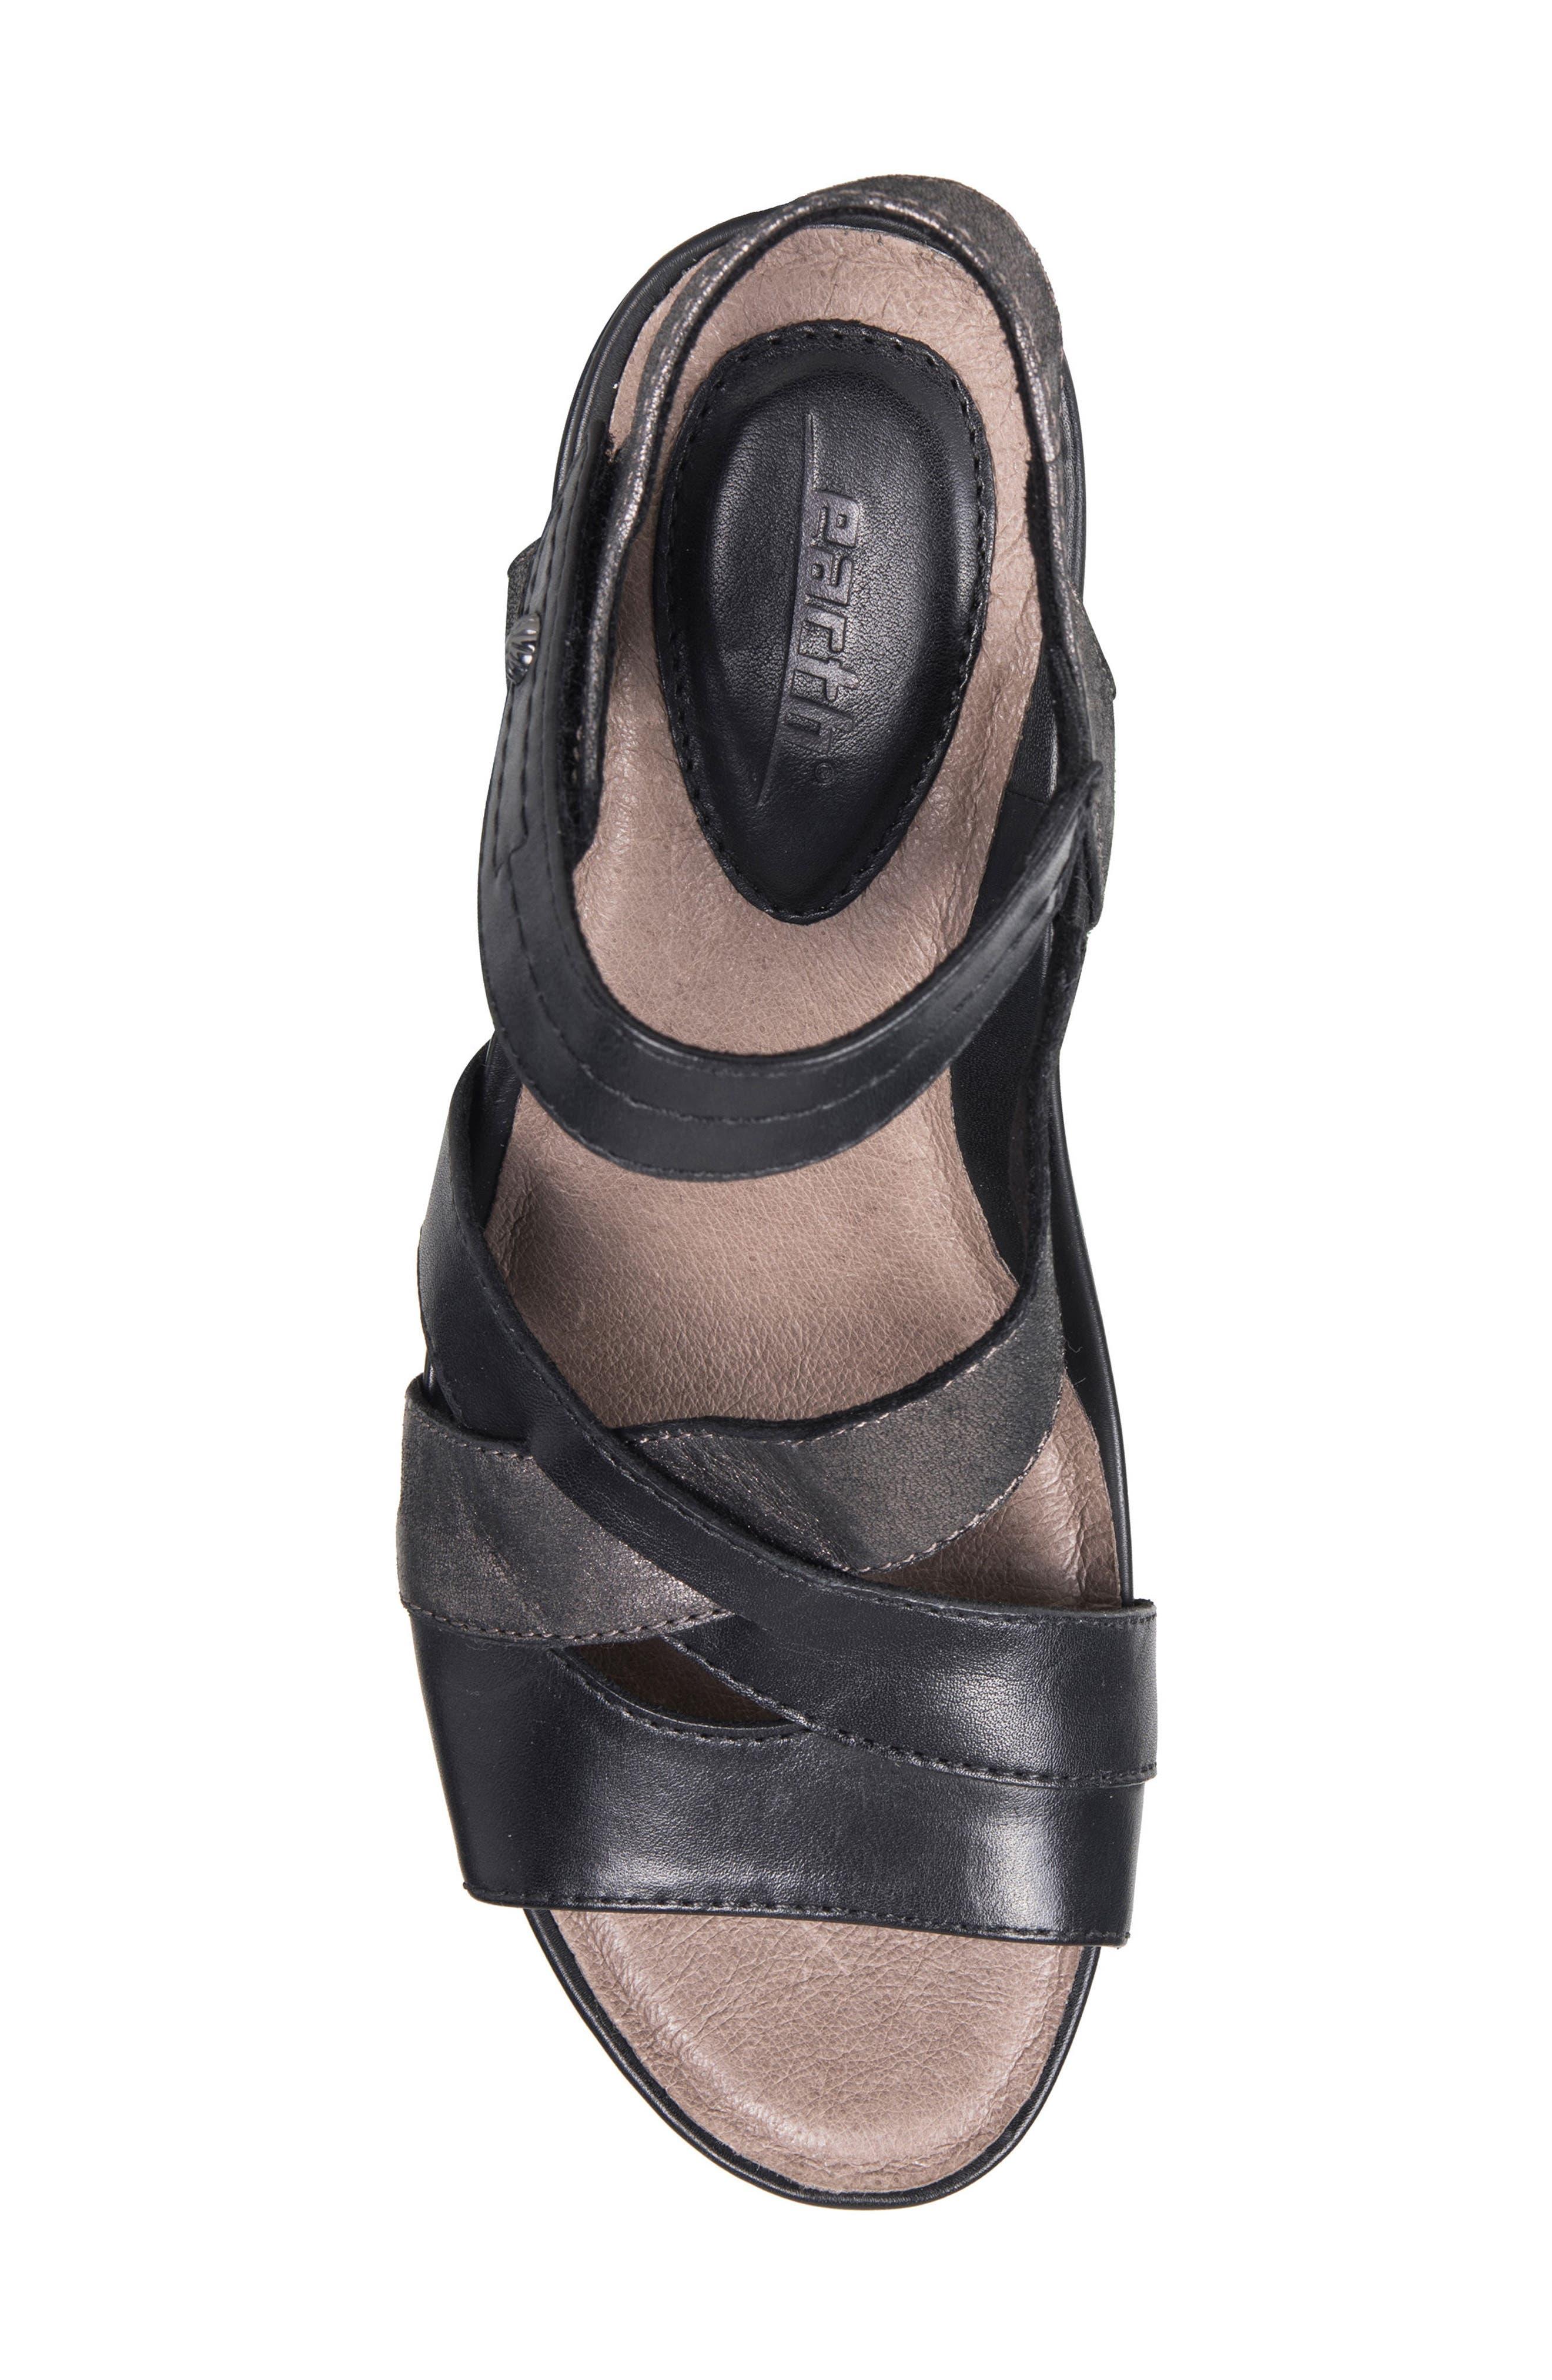 Thistle Wedge Sandal,                             Alternate thumbnail 13, color,